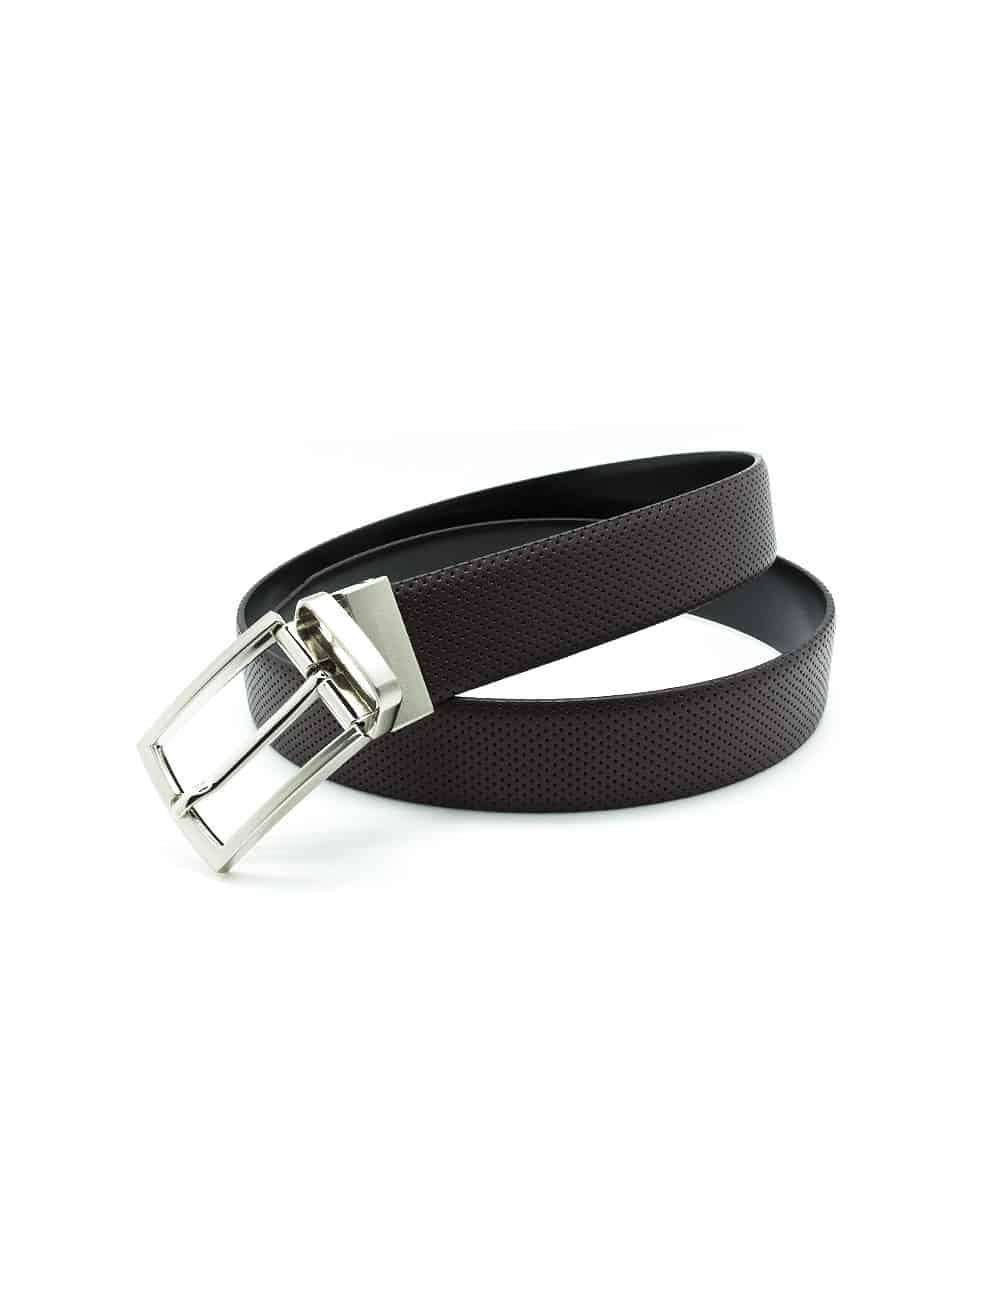 Dark Brown / Black Reversible Leather Belt LBR11.8